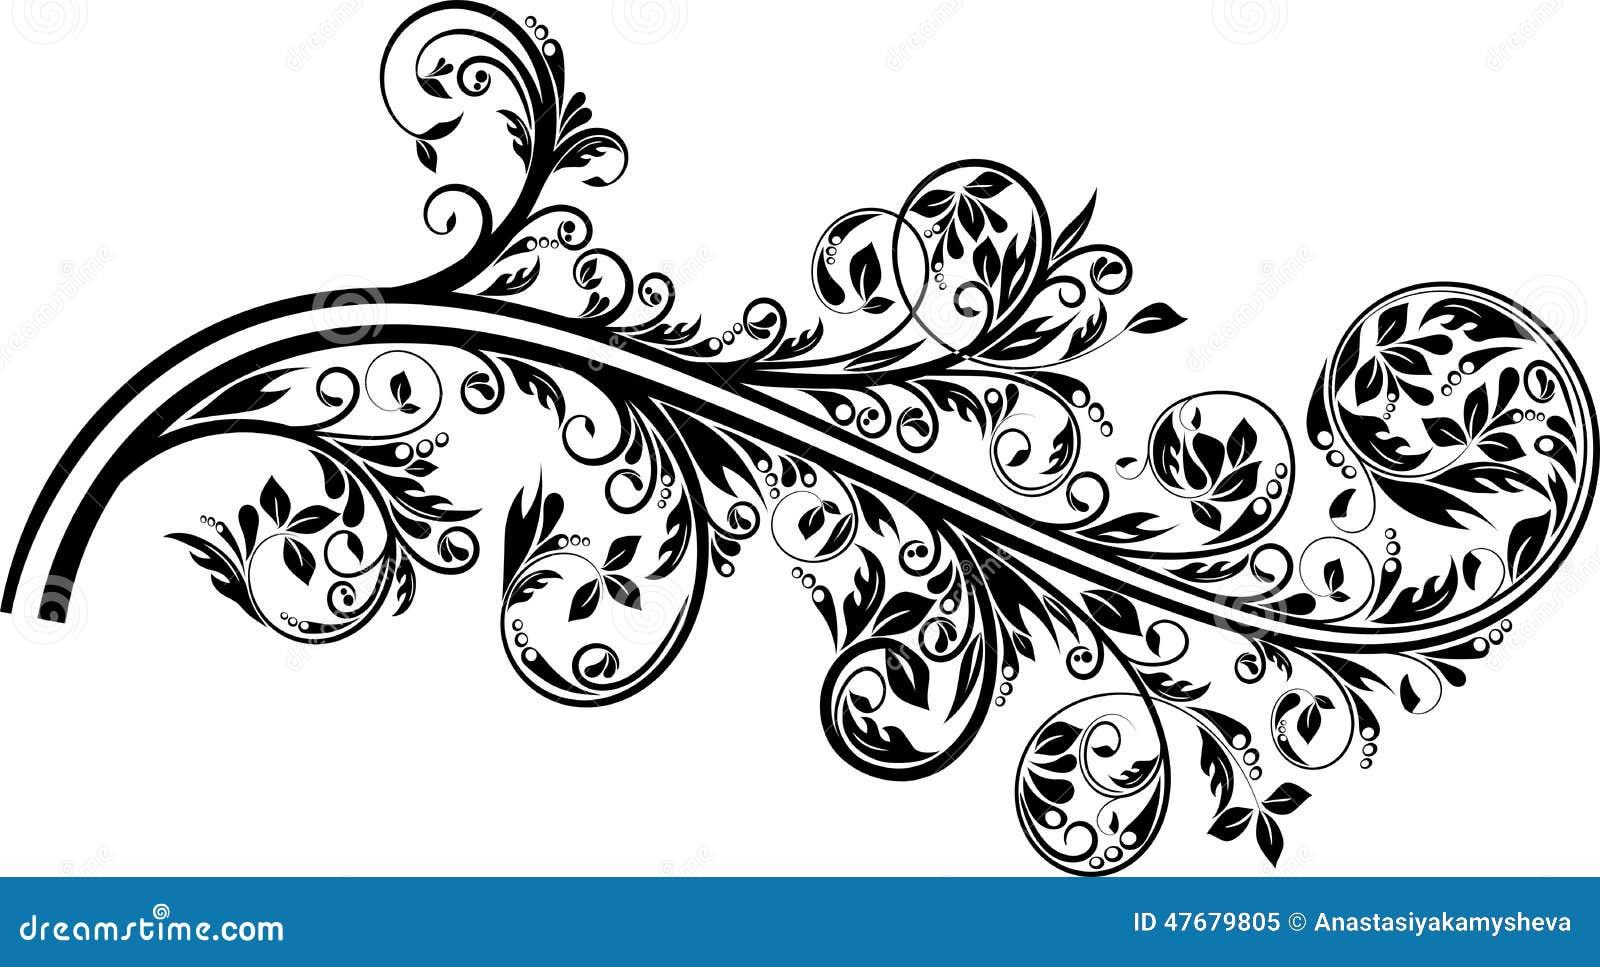 flourish ornament stock vector image of swirl fantasy. Black Bedroom Furniture Sets. Home Design Ideas